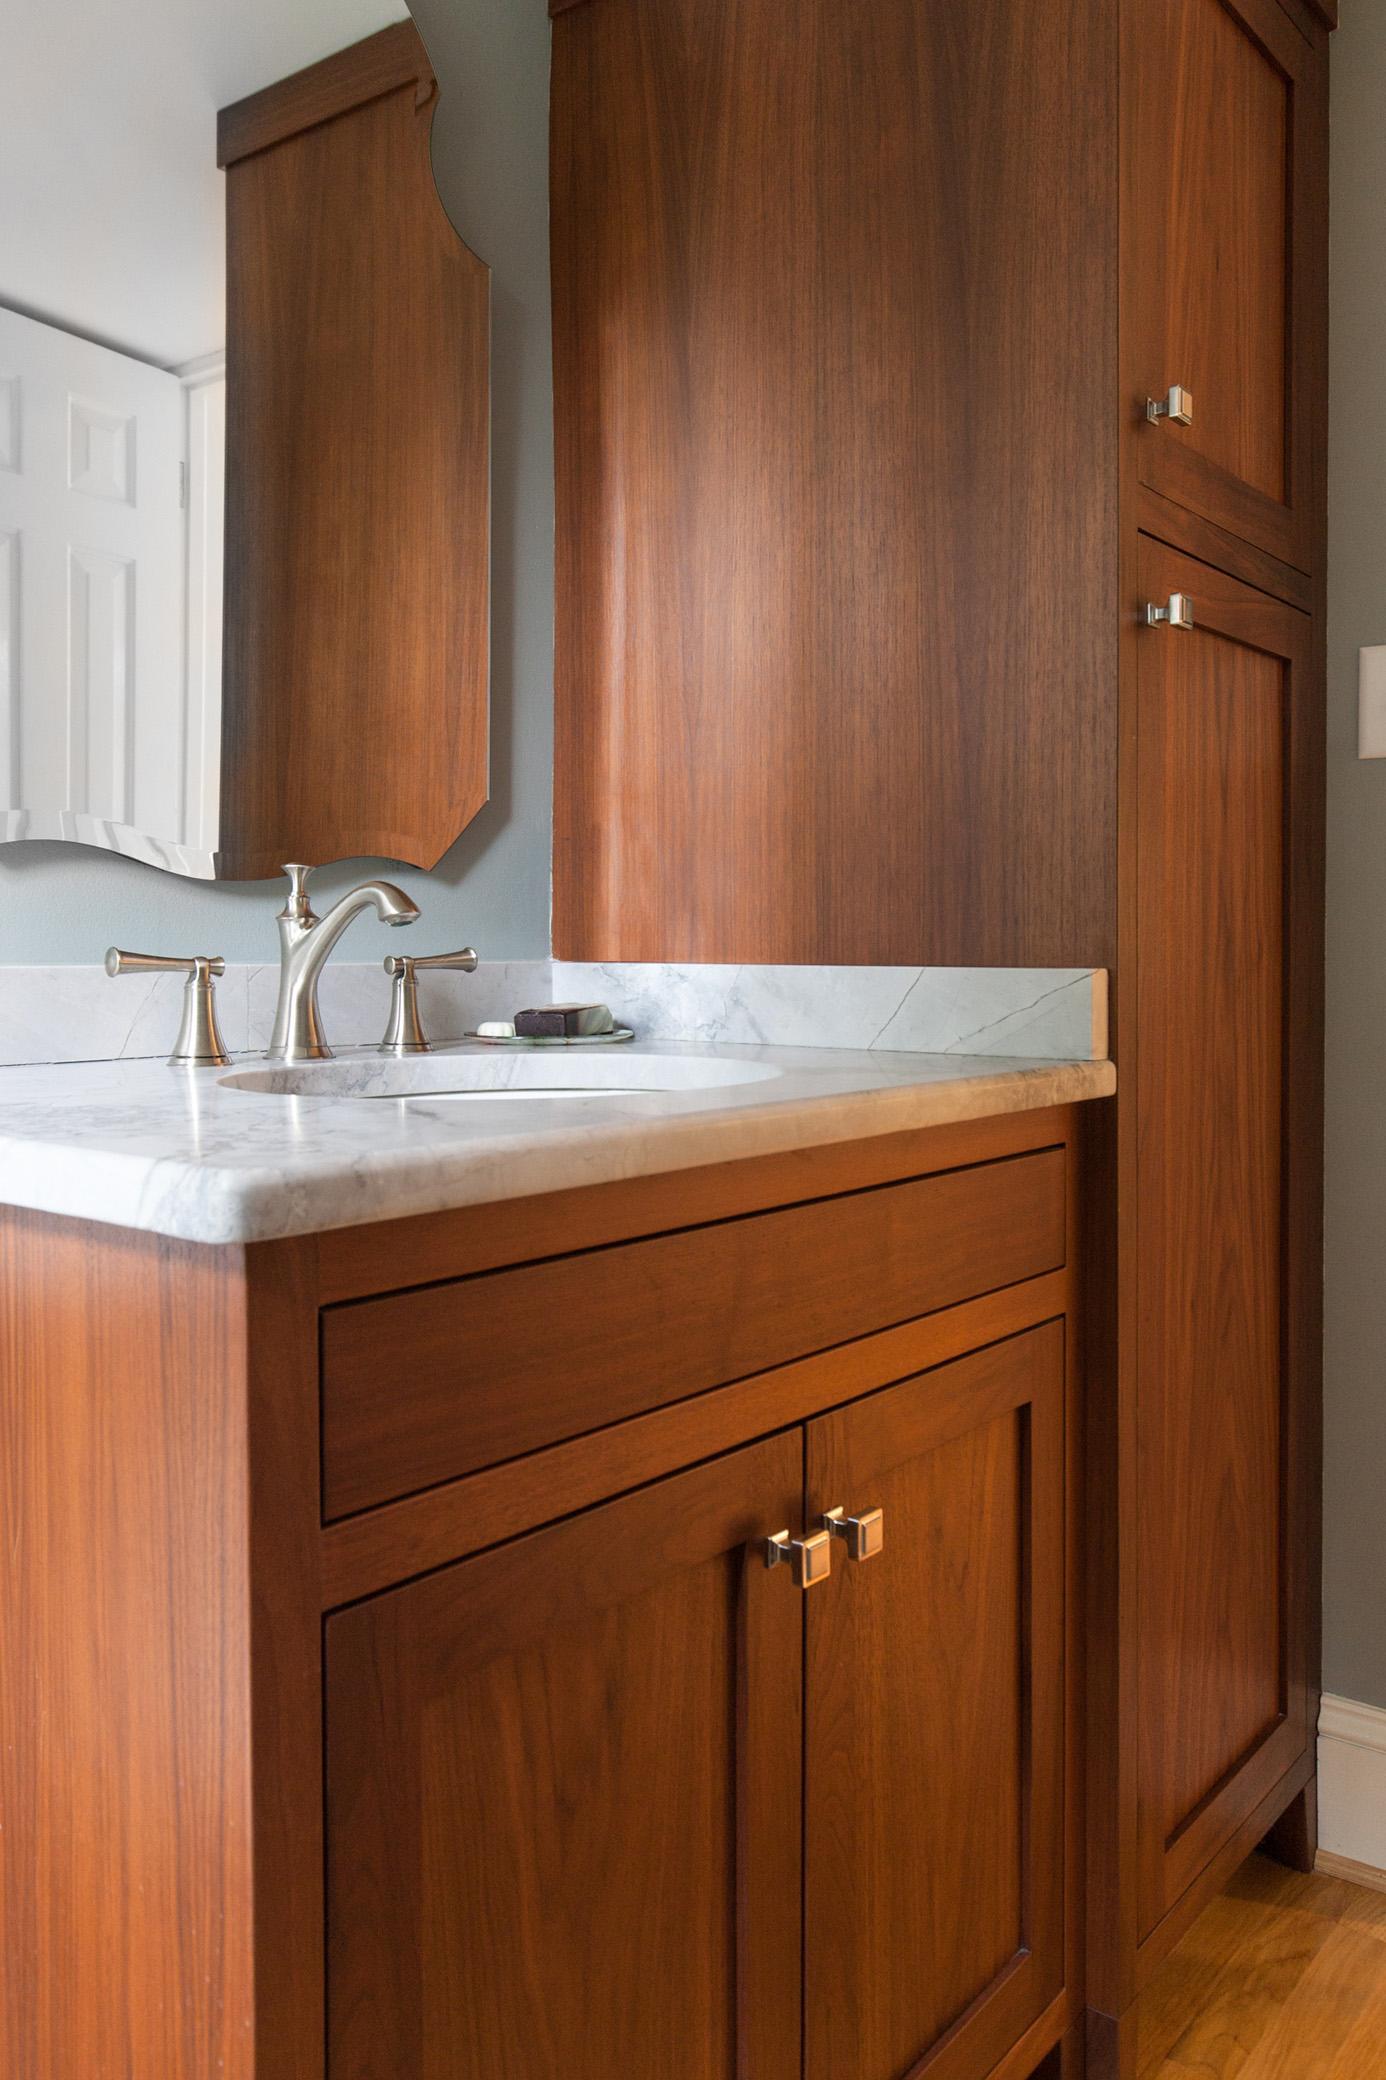 Custom walnut vanity in powder room.